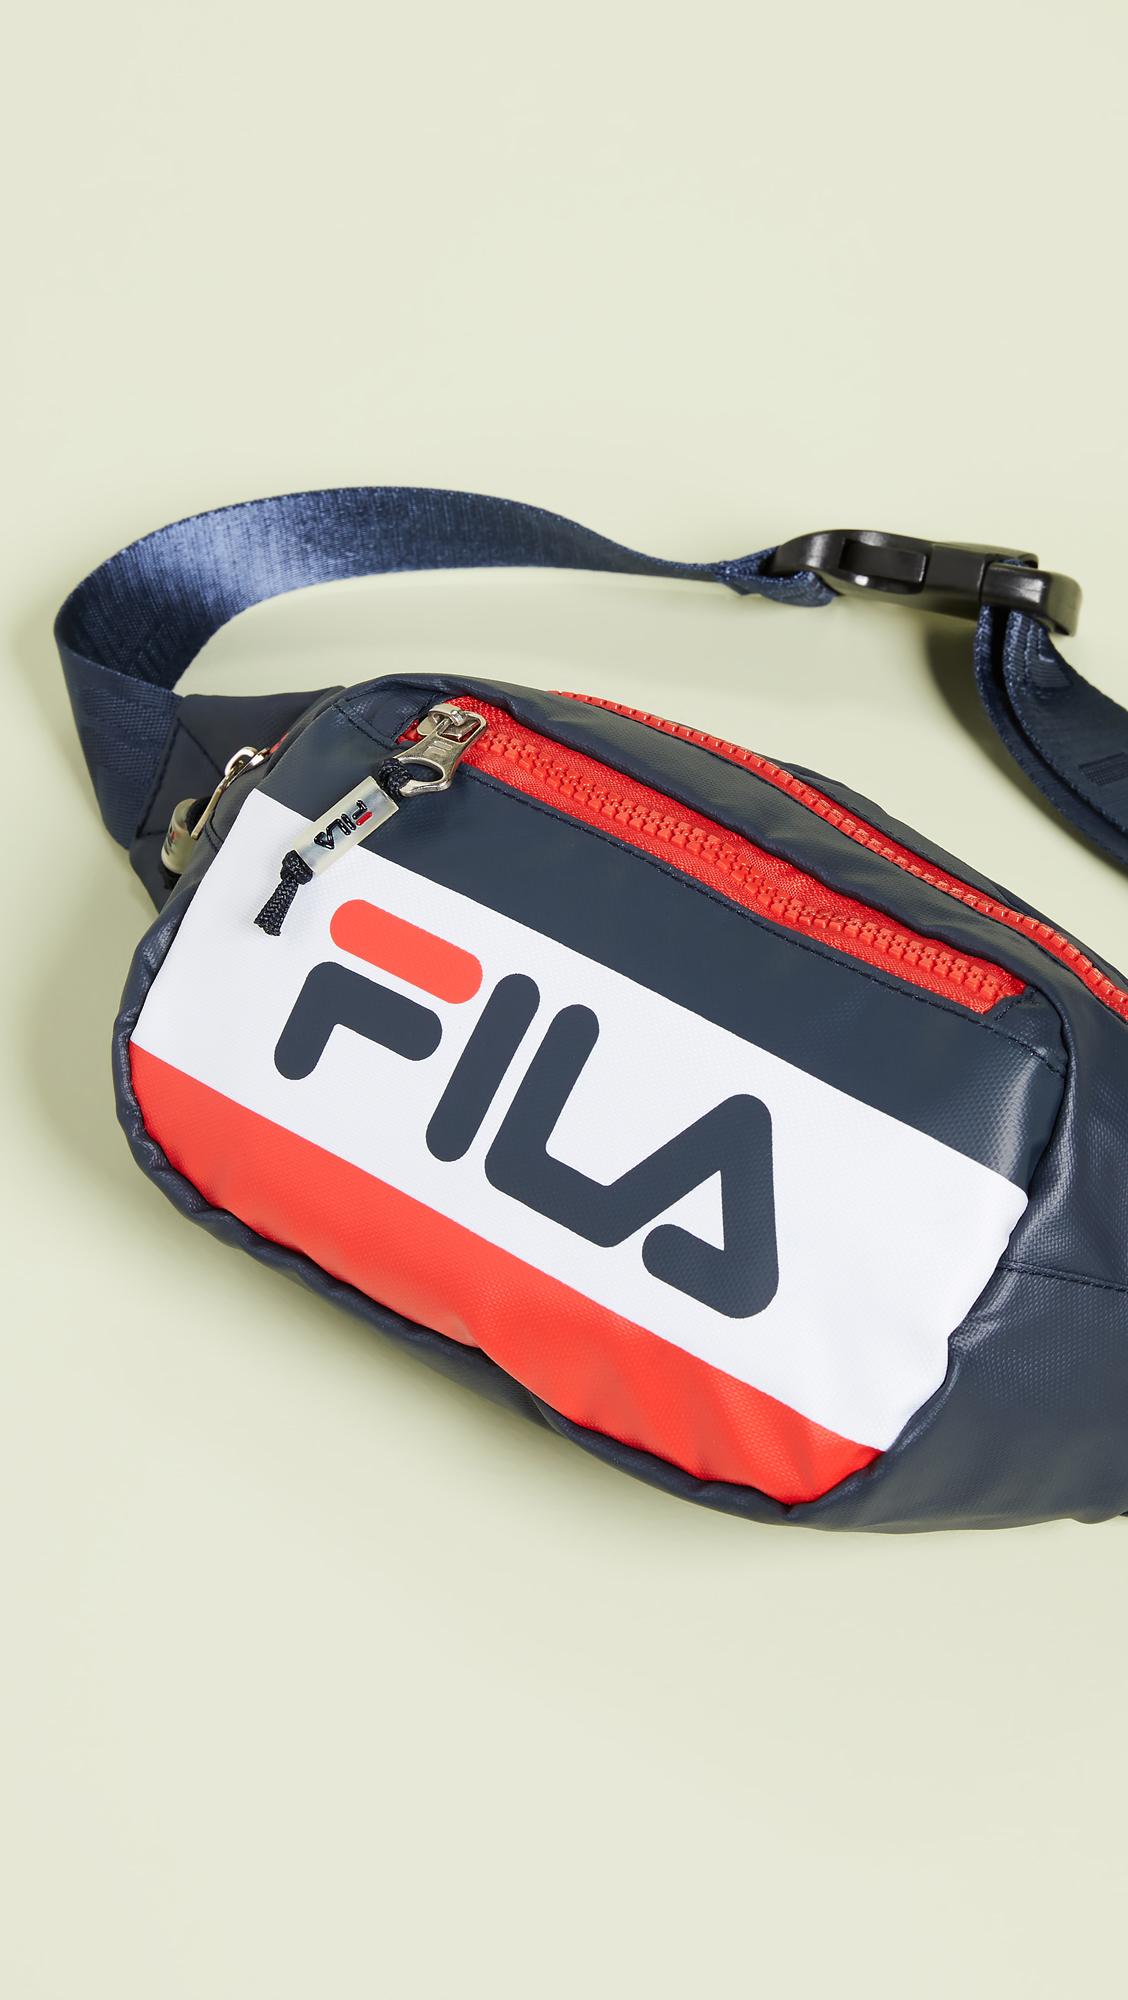 Fila Hunts Belt Bag Shopbop Save Up To 25 Use Code More18 Ready Stock Waist Zipper On